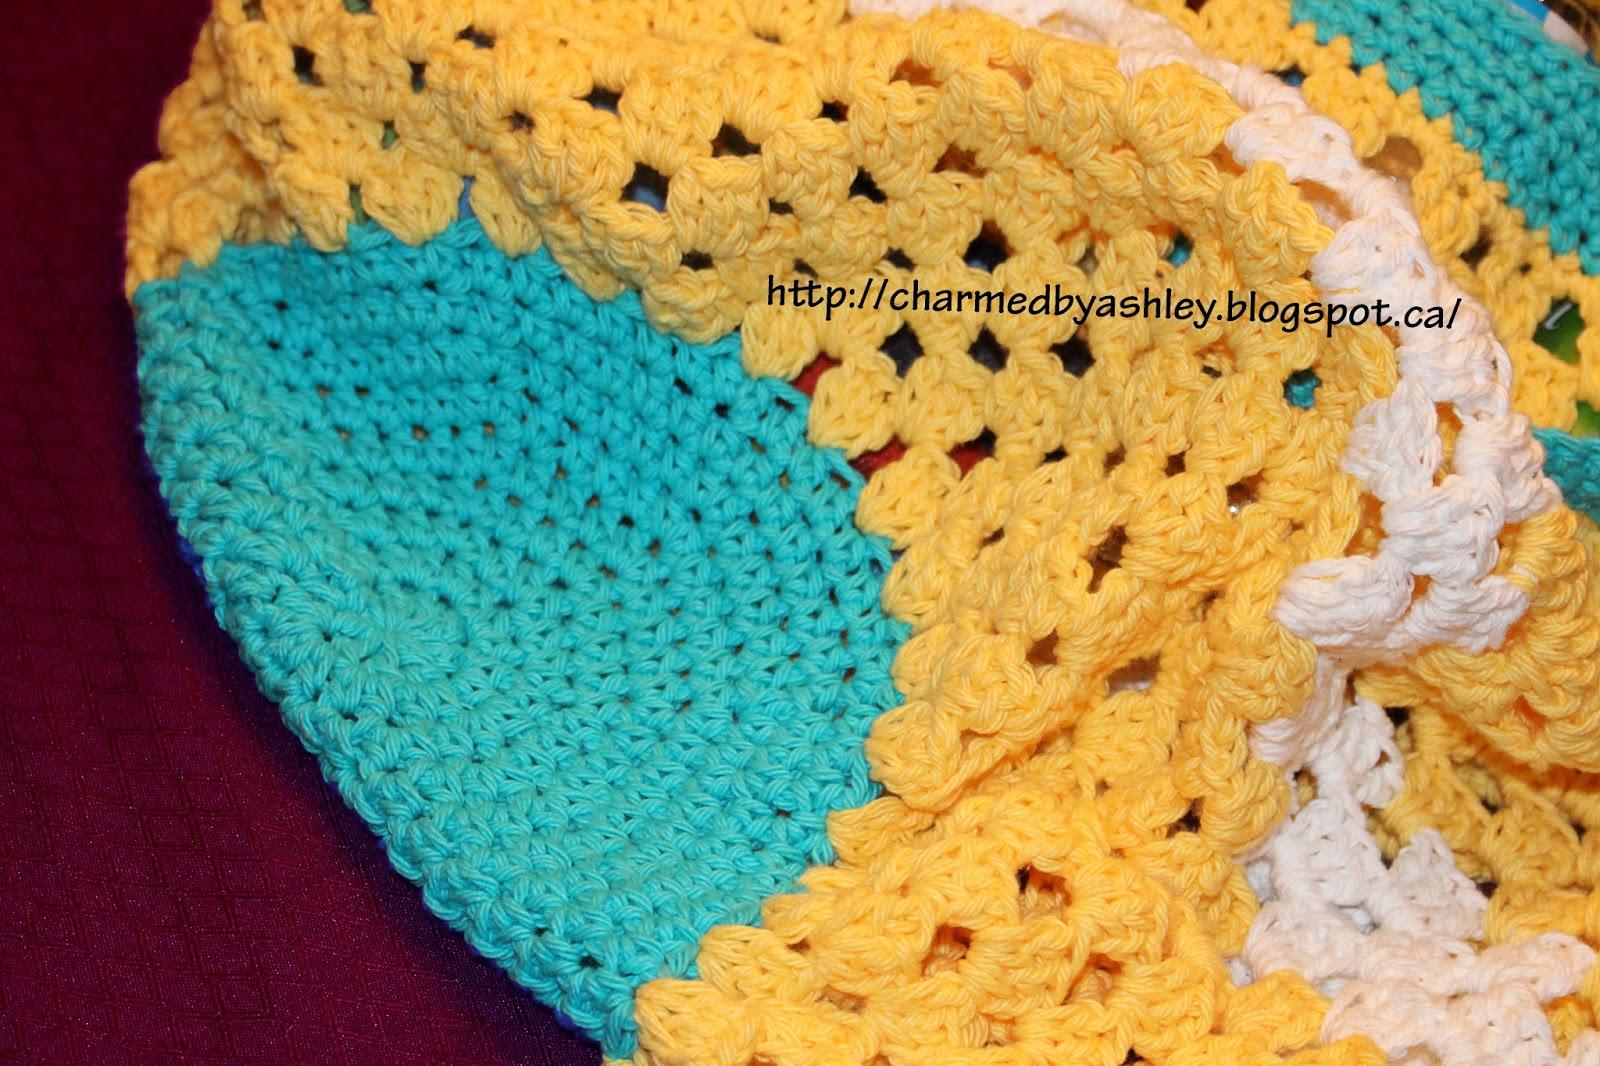 Summery Beach Bag / tote Crochet Pattern - Charmed By Ashley